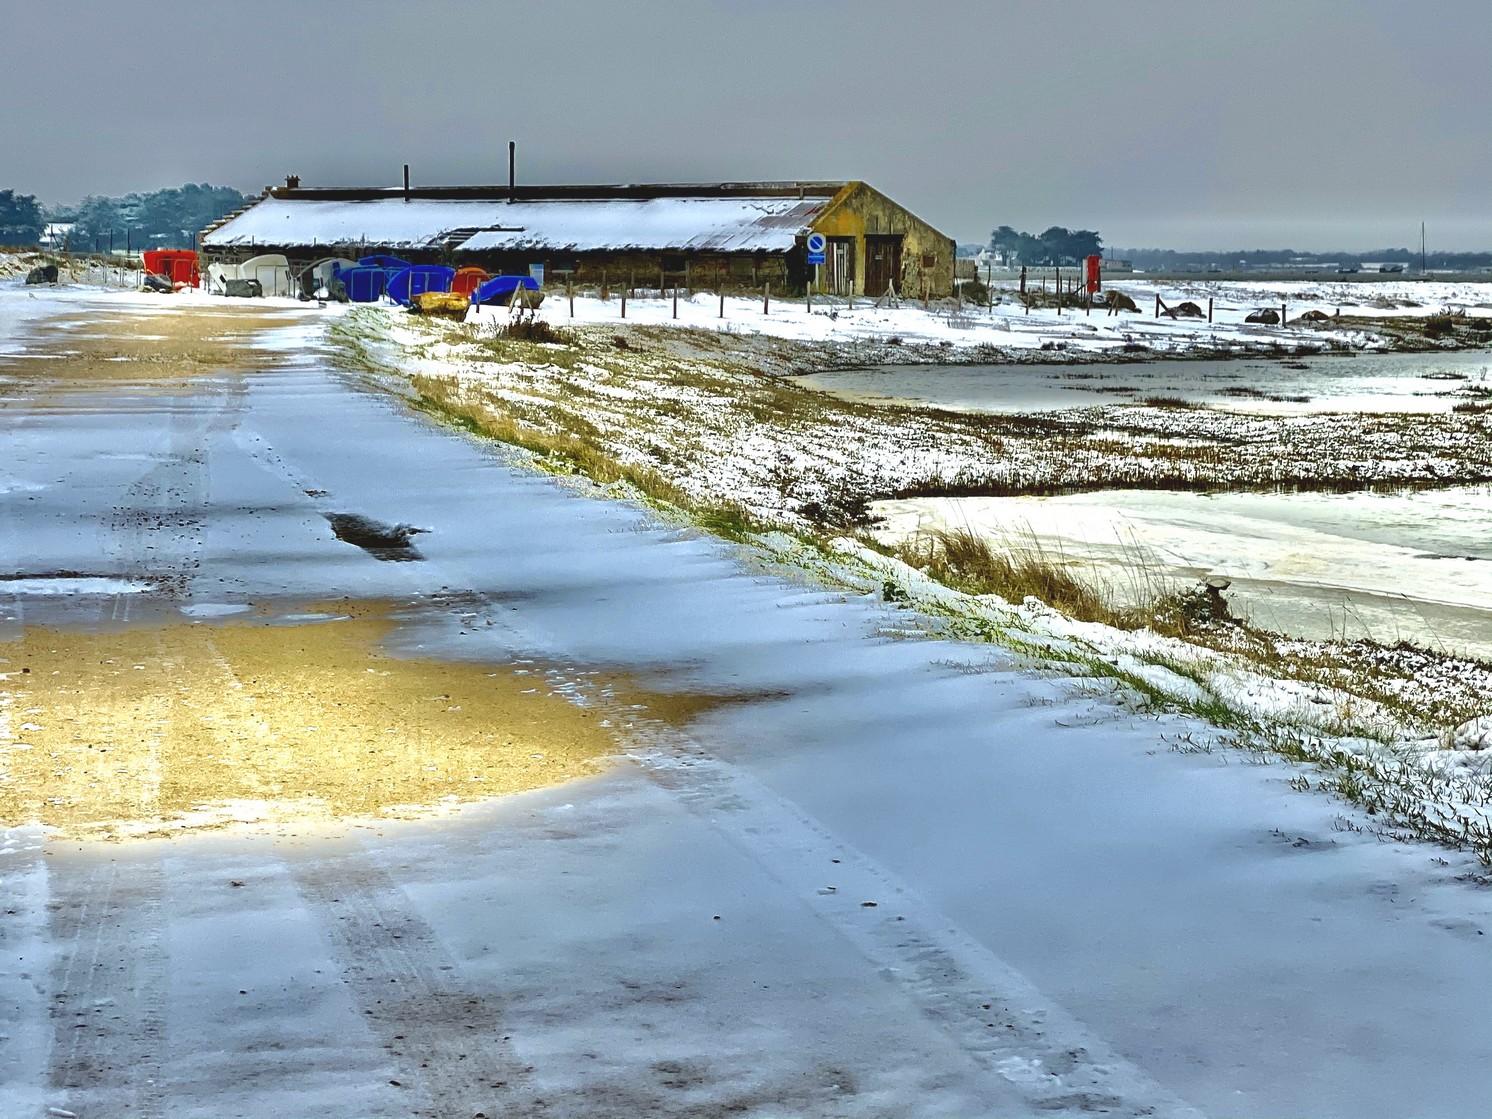 Penerf en Damgan sous la neige - morbihan bretagne©Philippe Jaquemin (6)